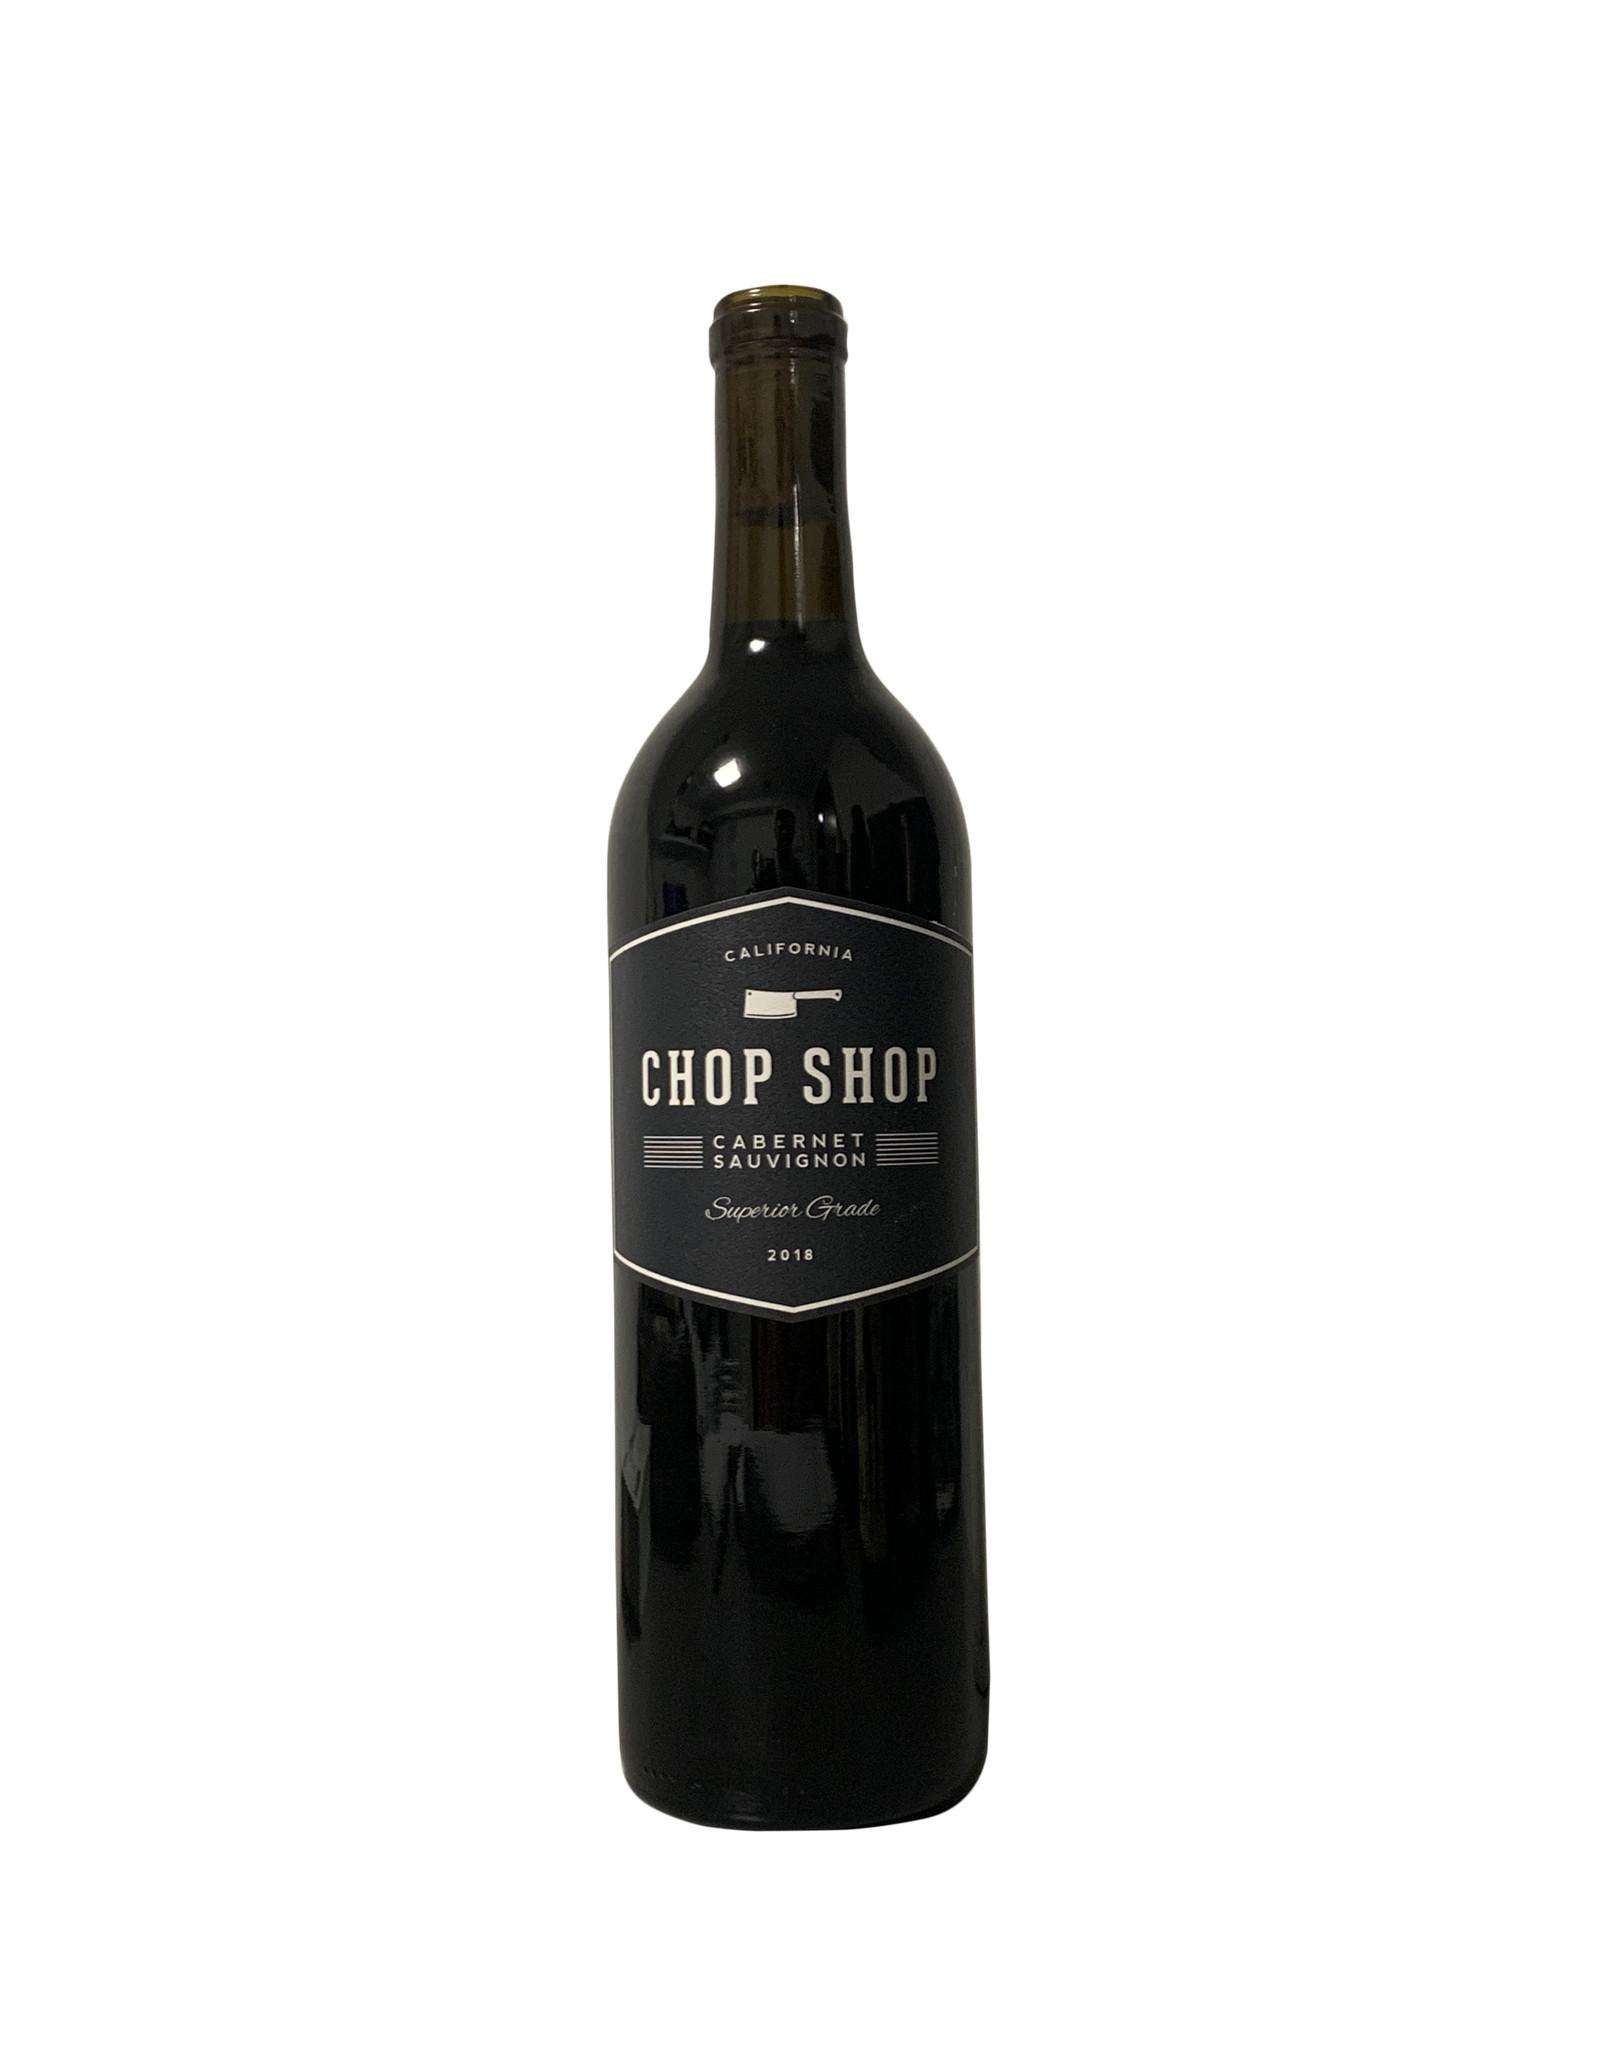 Chop Shop Cabernet Sauvignon 2018, California (750mL)